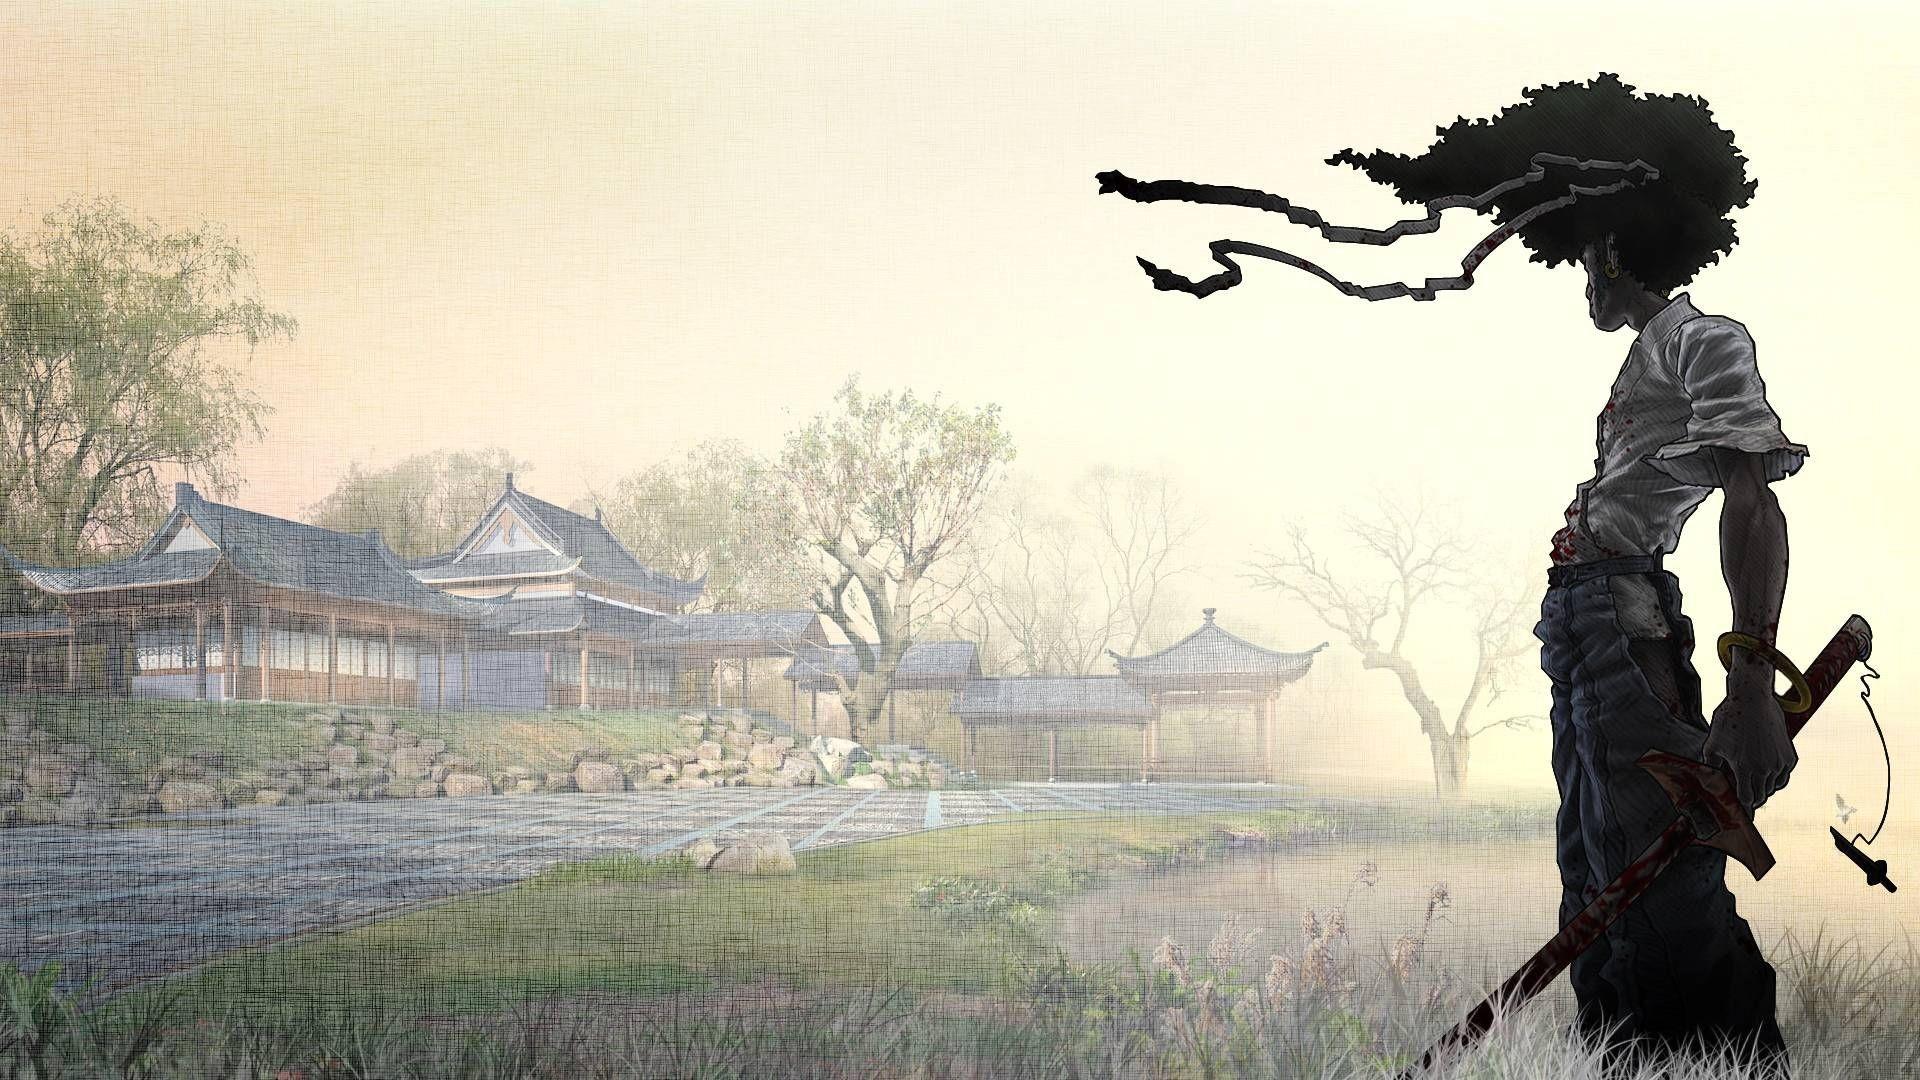 Res: 1920x1080, Afro Samurai Wallpapers HD - Wallpaper Cave